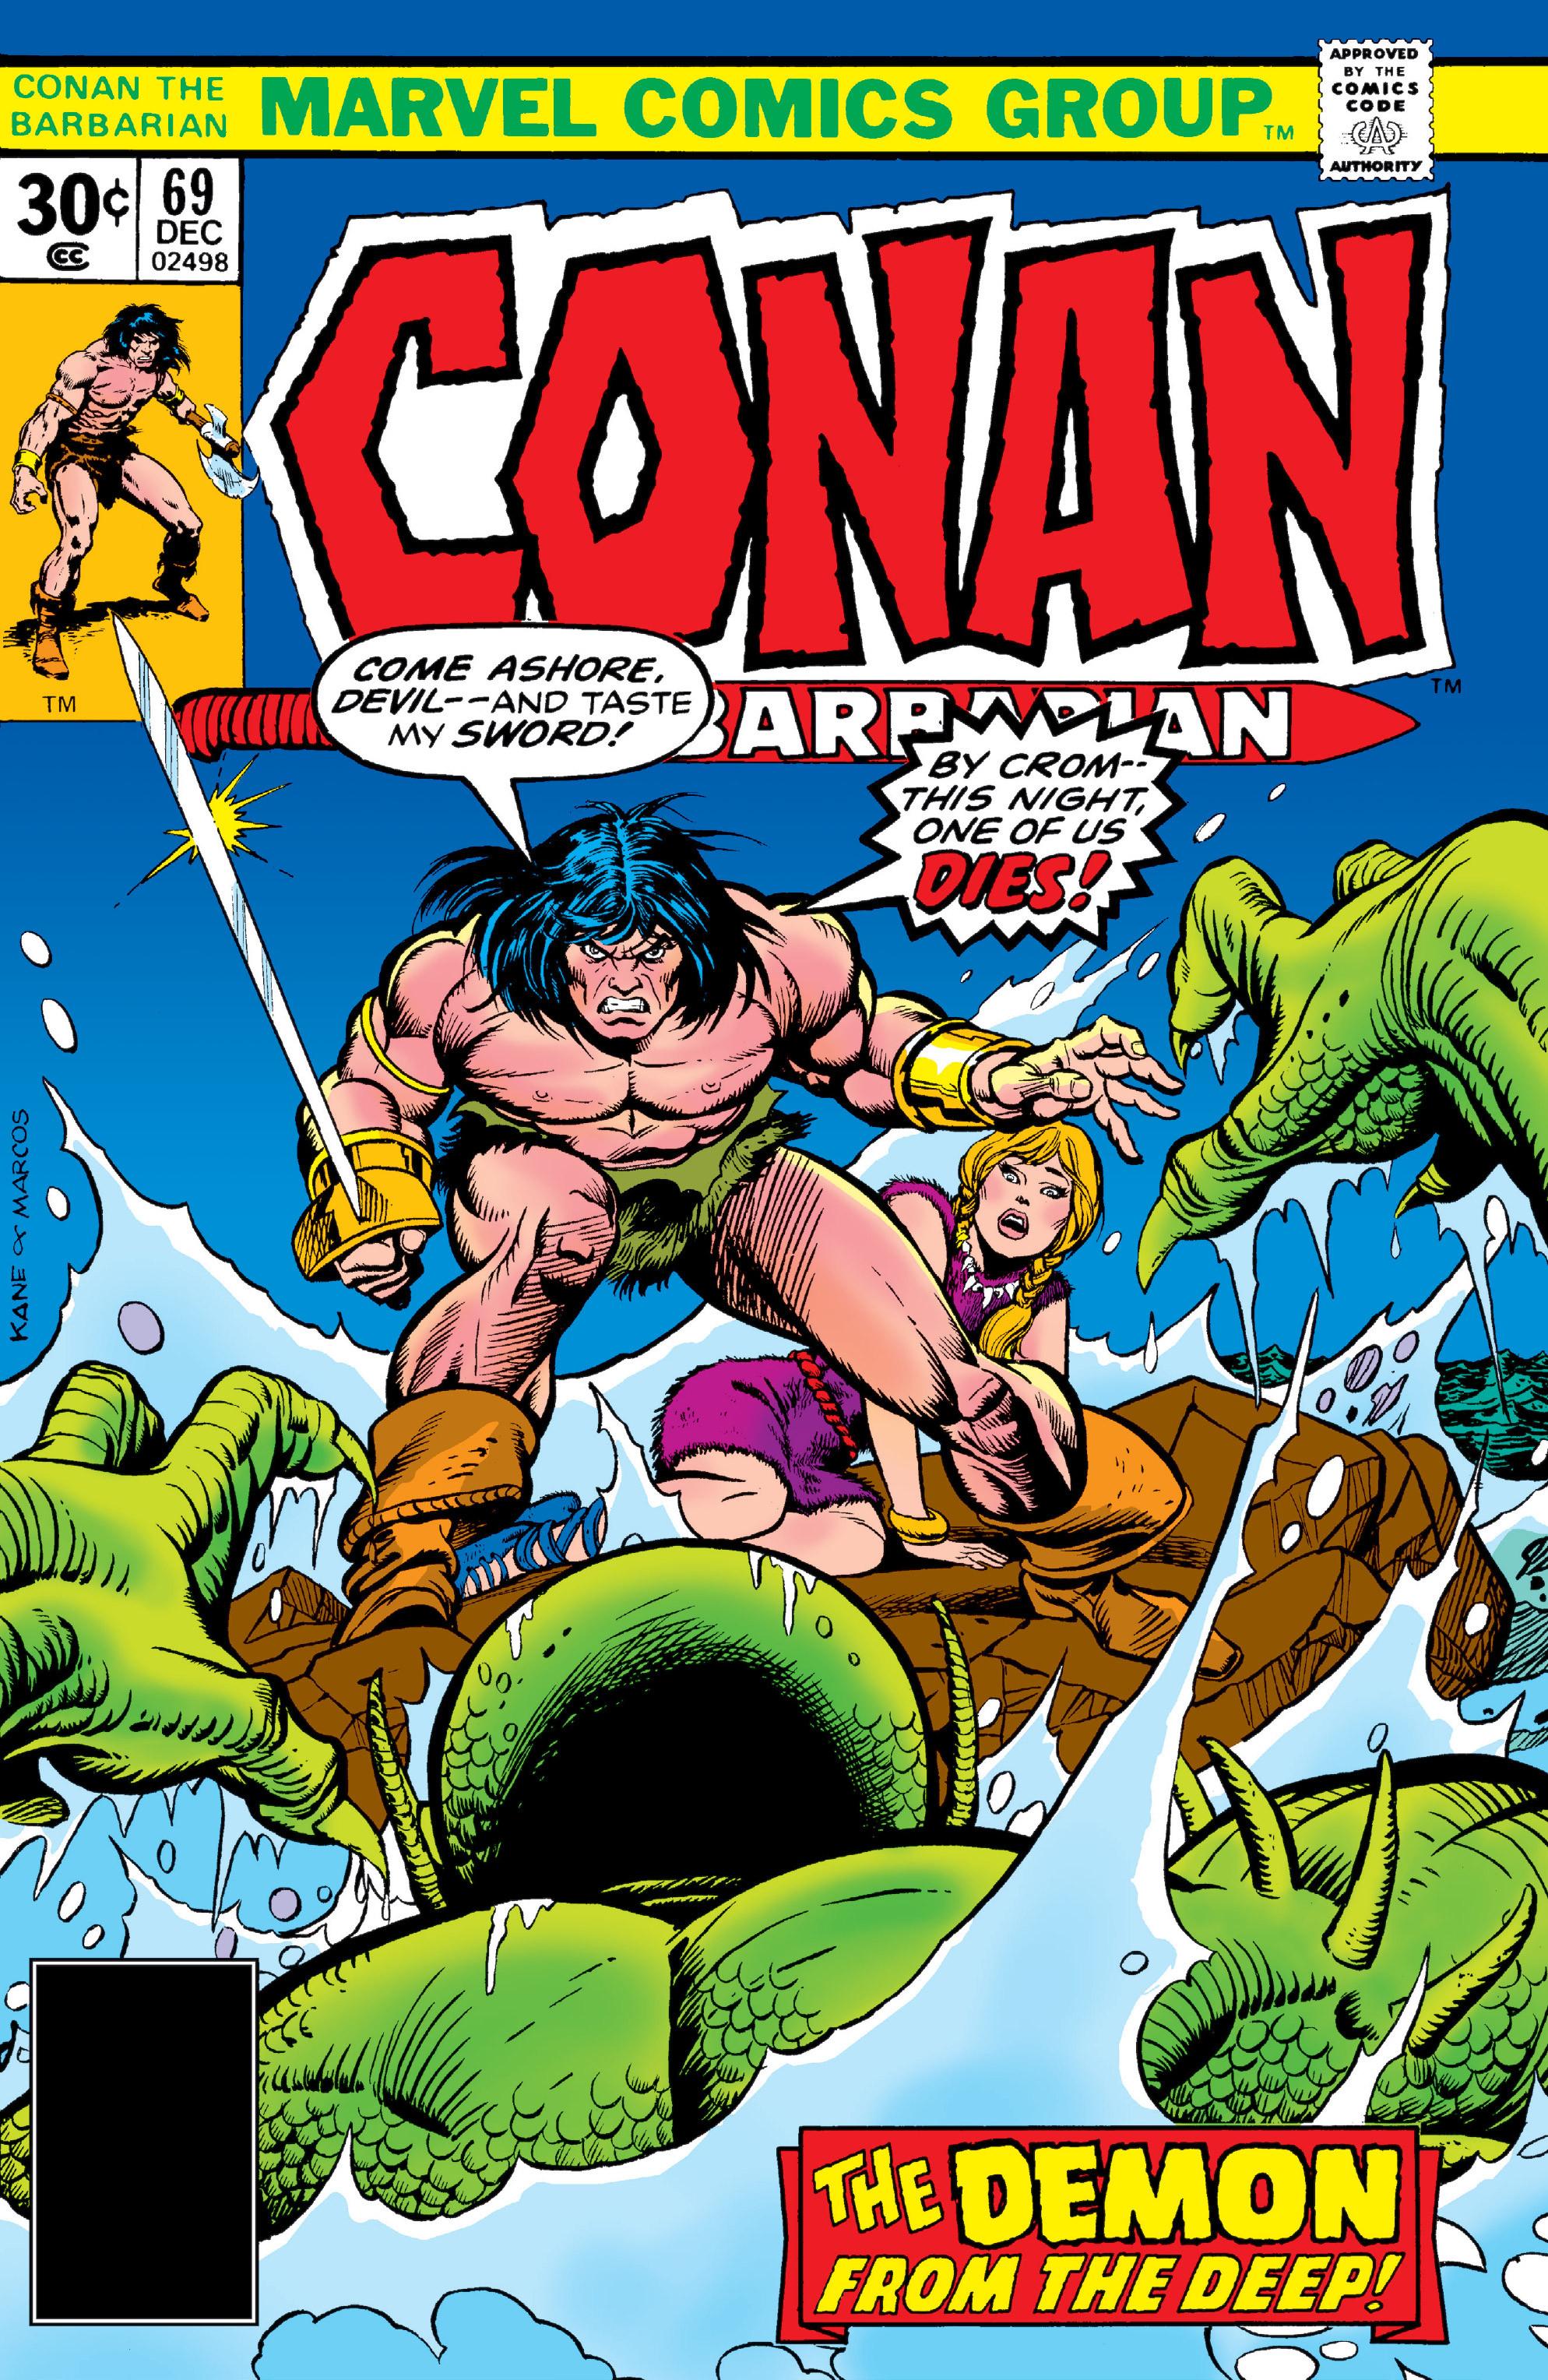 Conan the Barbarian Vol 1 69